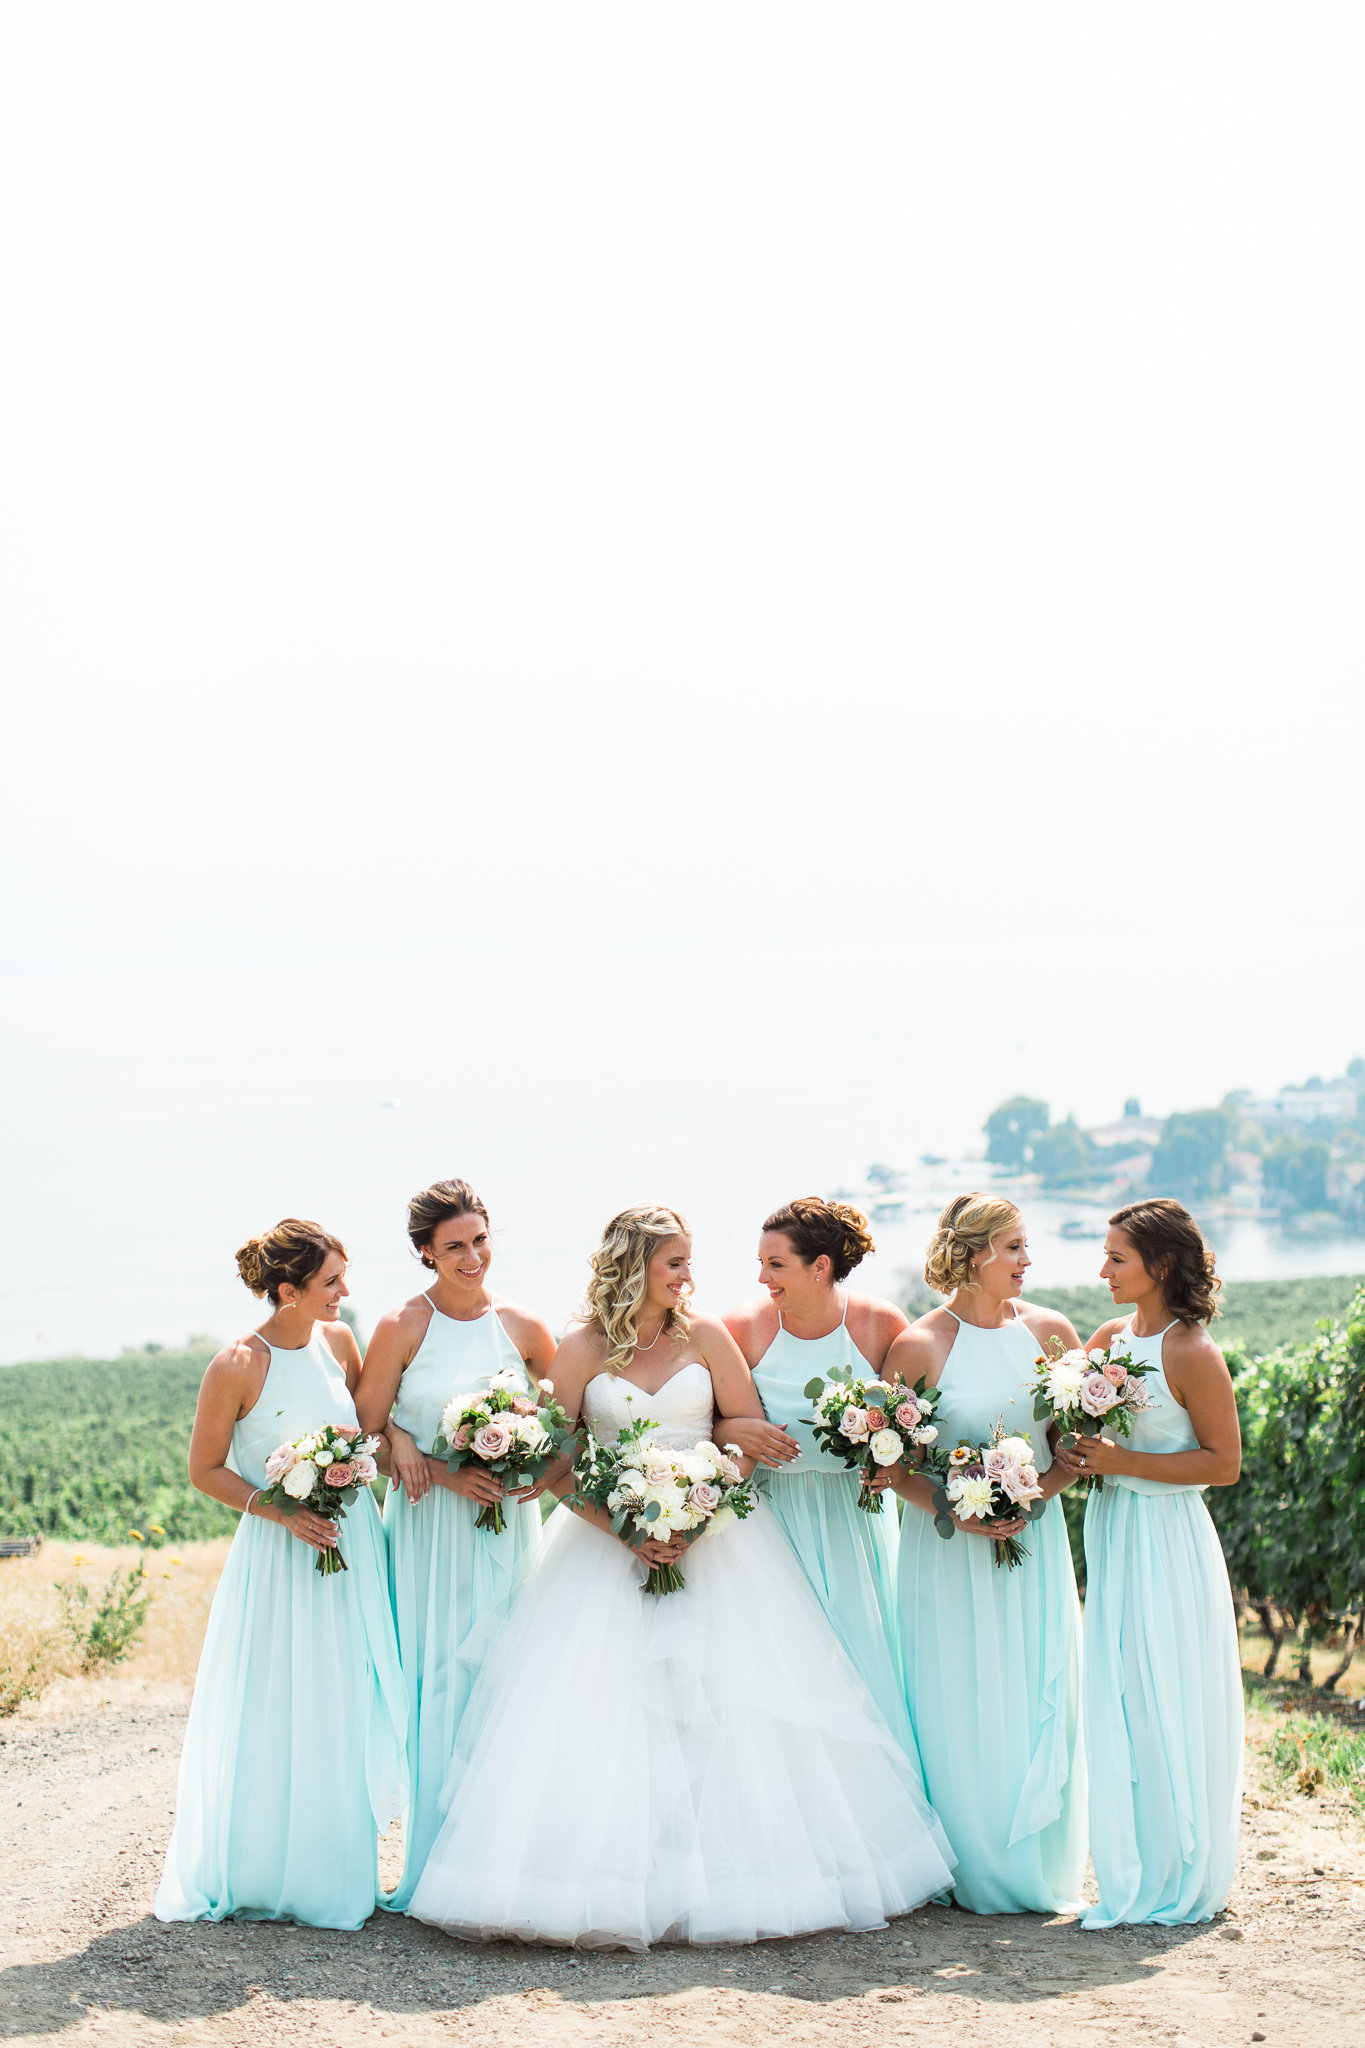 20170819_Amber & Ben's Wedding-1430 (Web) copy.jpg